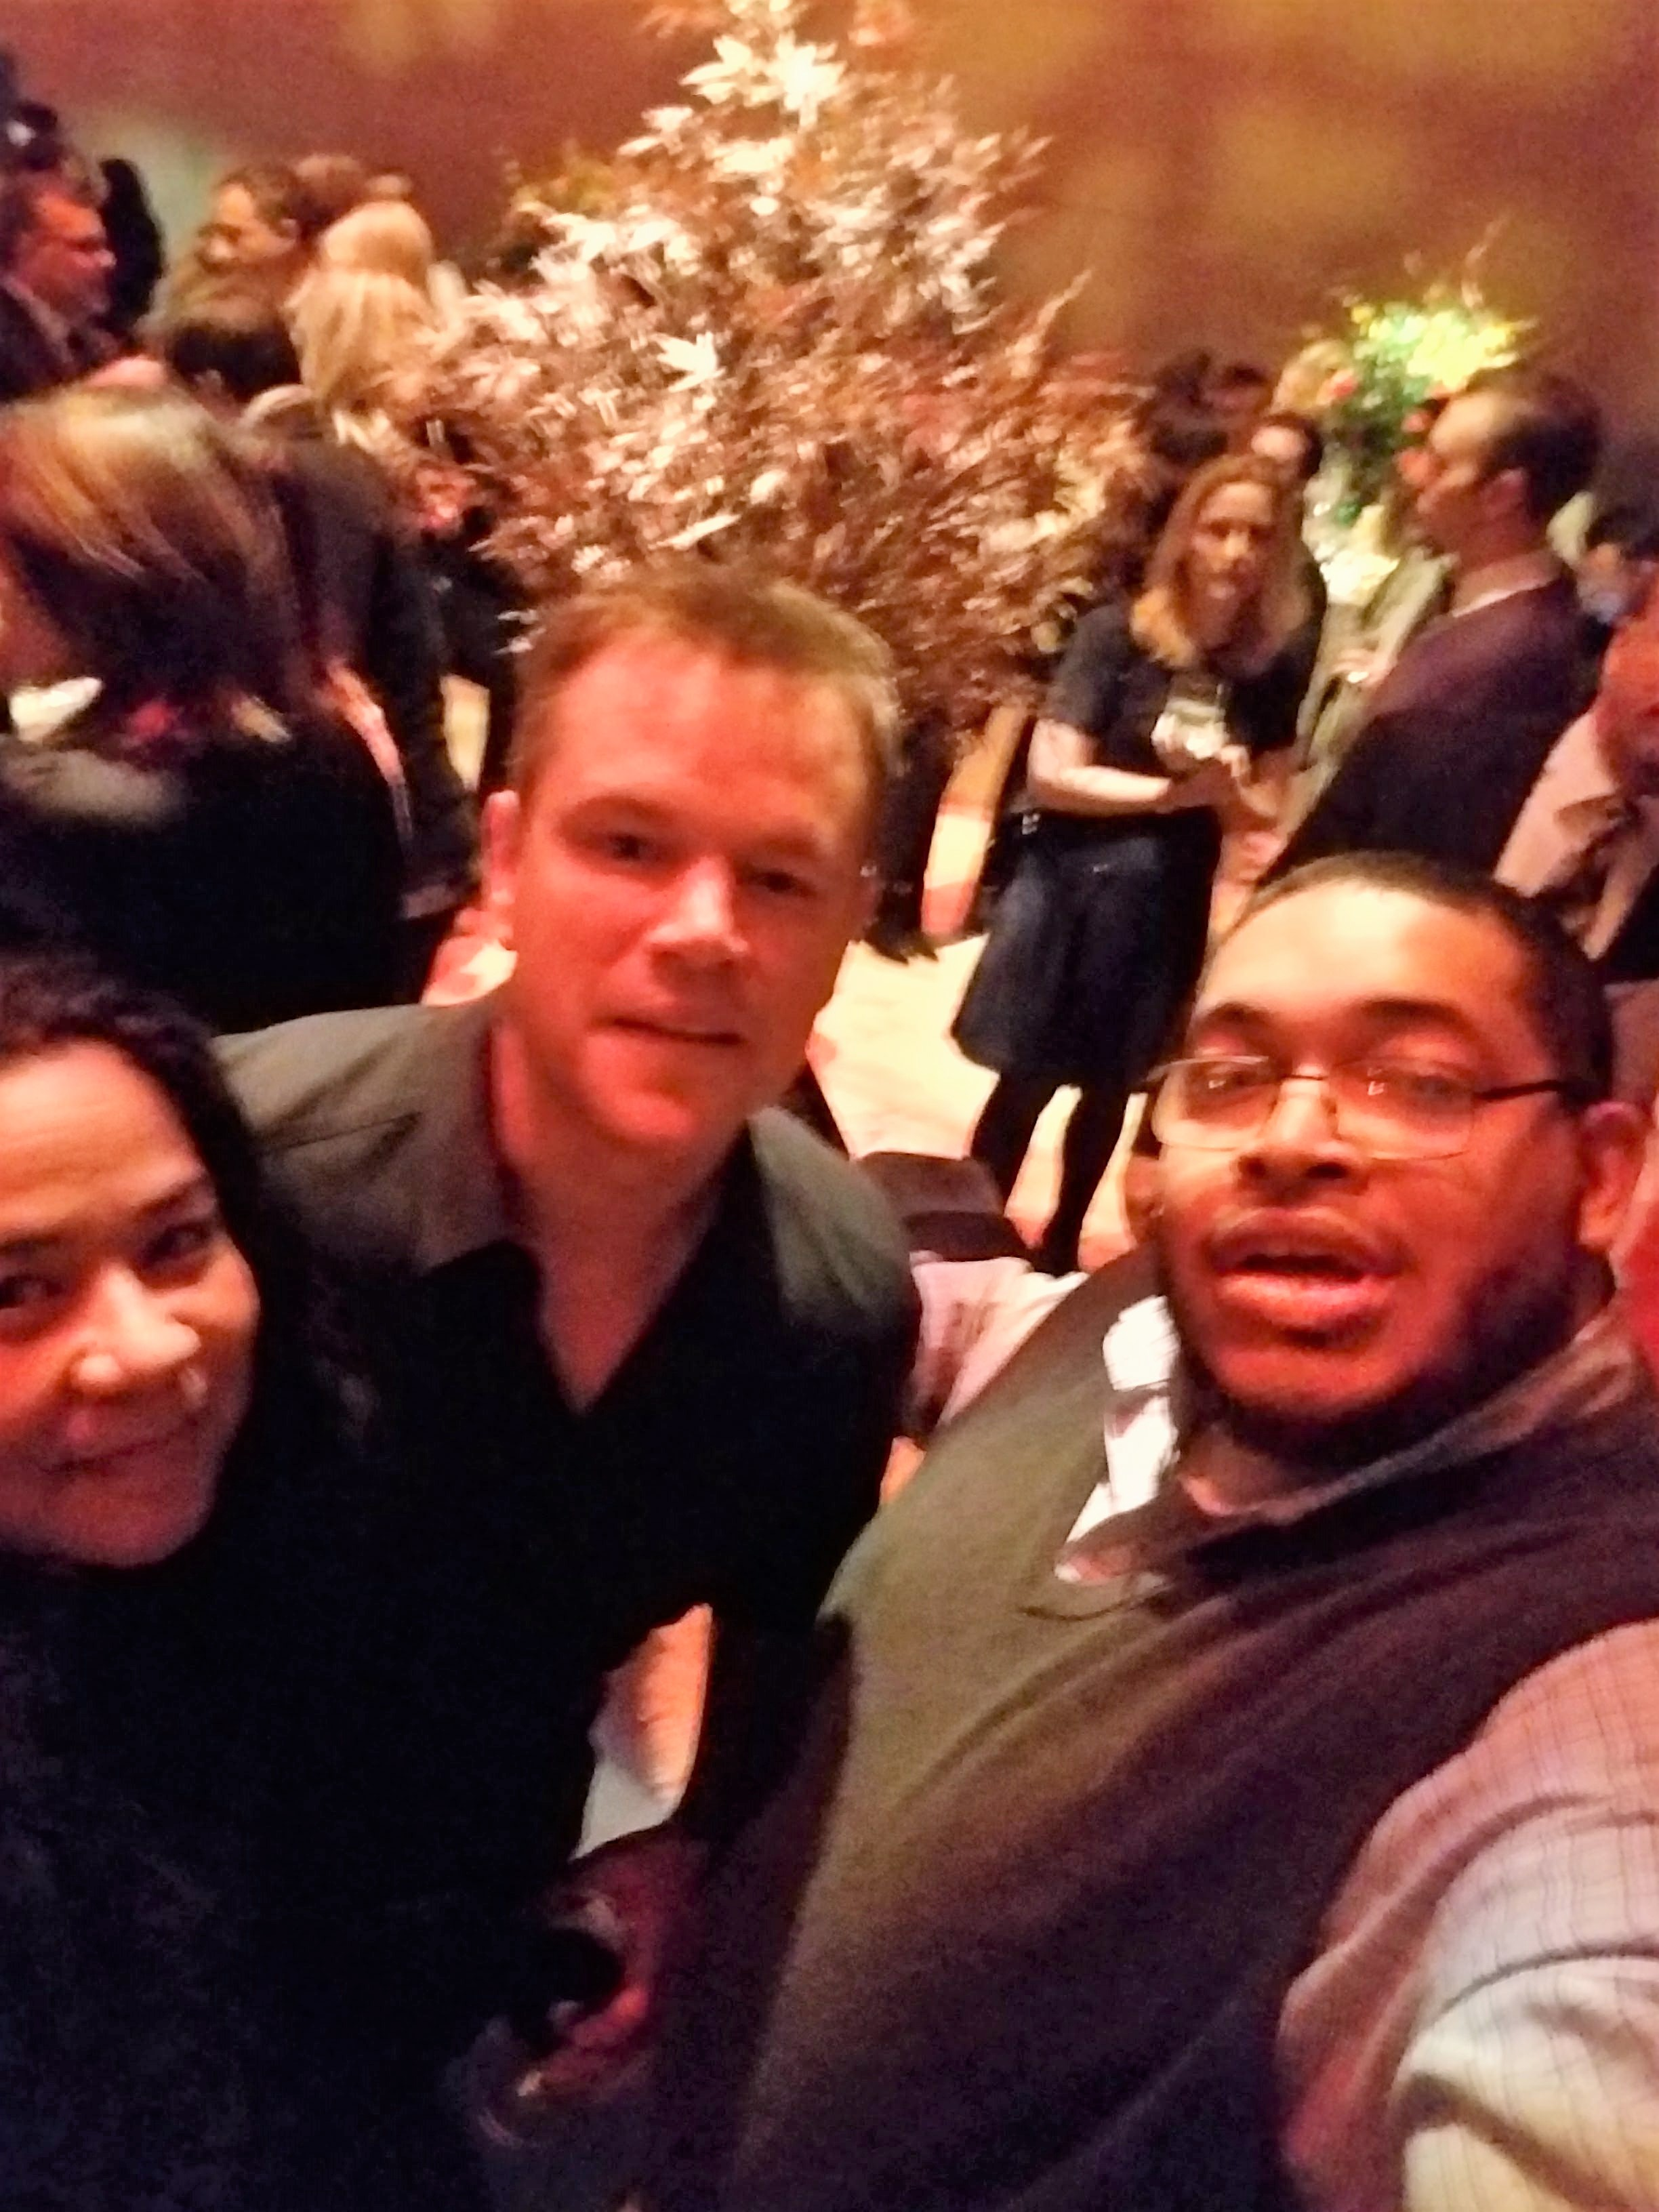 12 Strong- My Story of Meeting the 12 Horsemen and Attending the World Premier- Actor Matt Damon